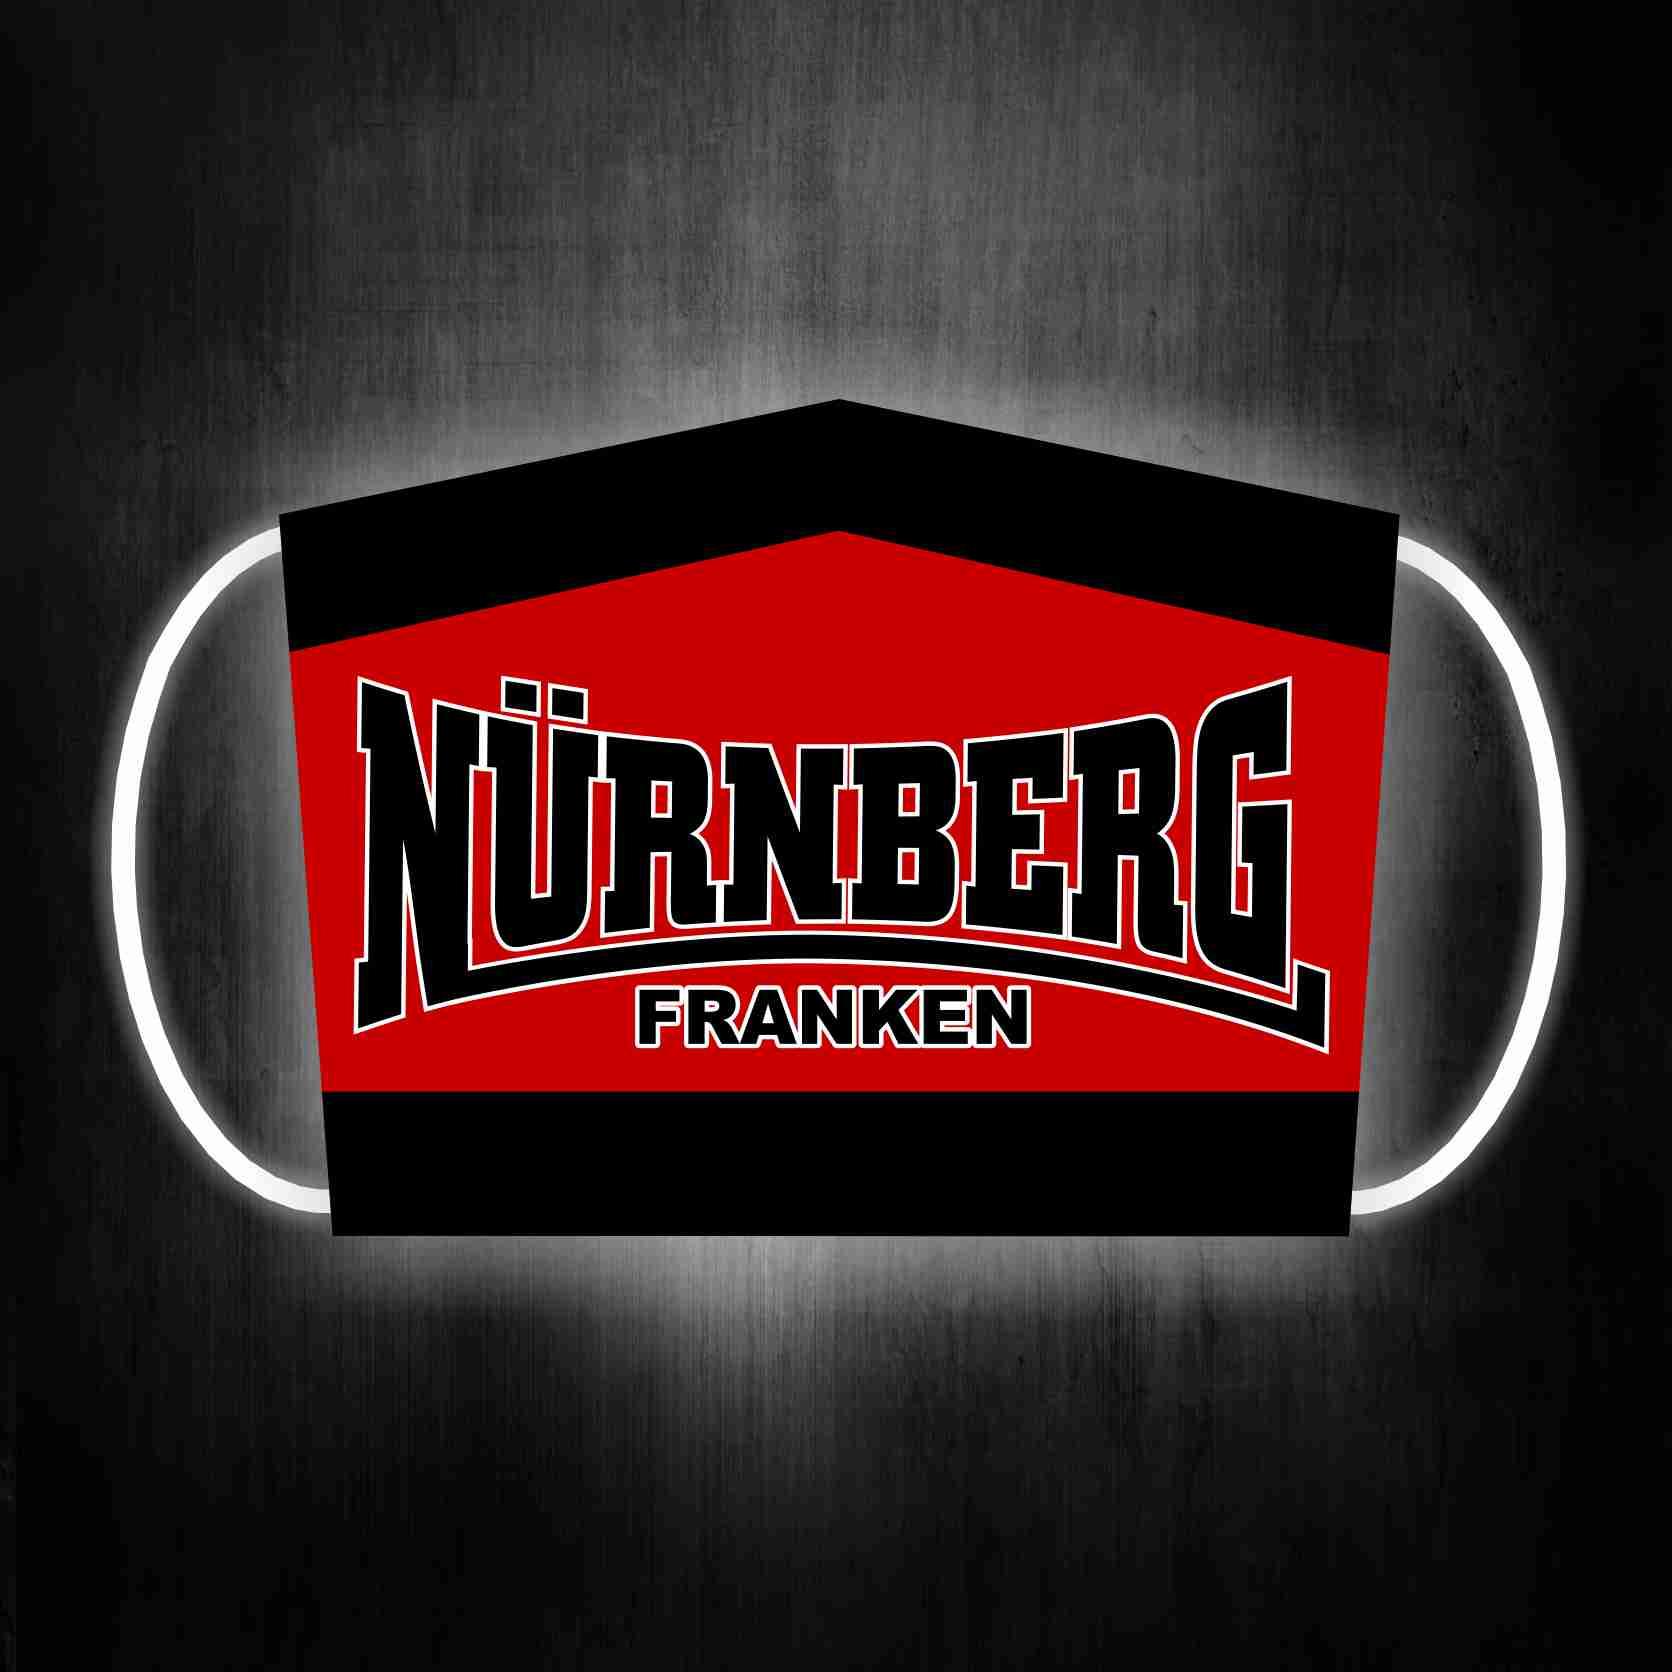 Gesichtsmaske für Glubberer Nürnberg Franken Oldschool